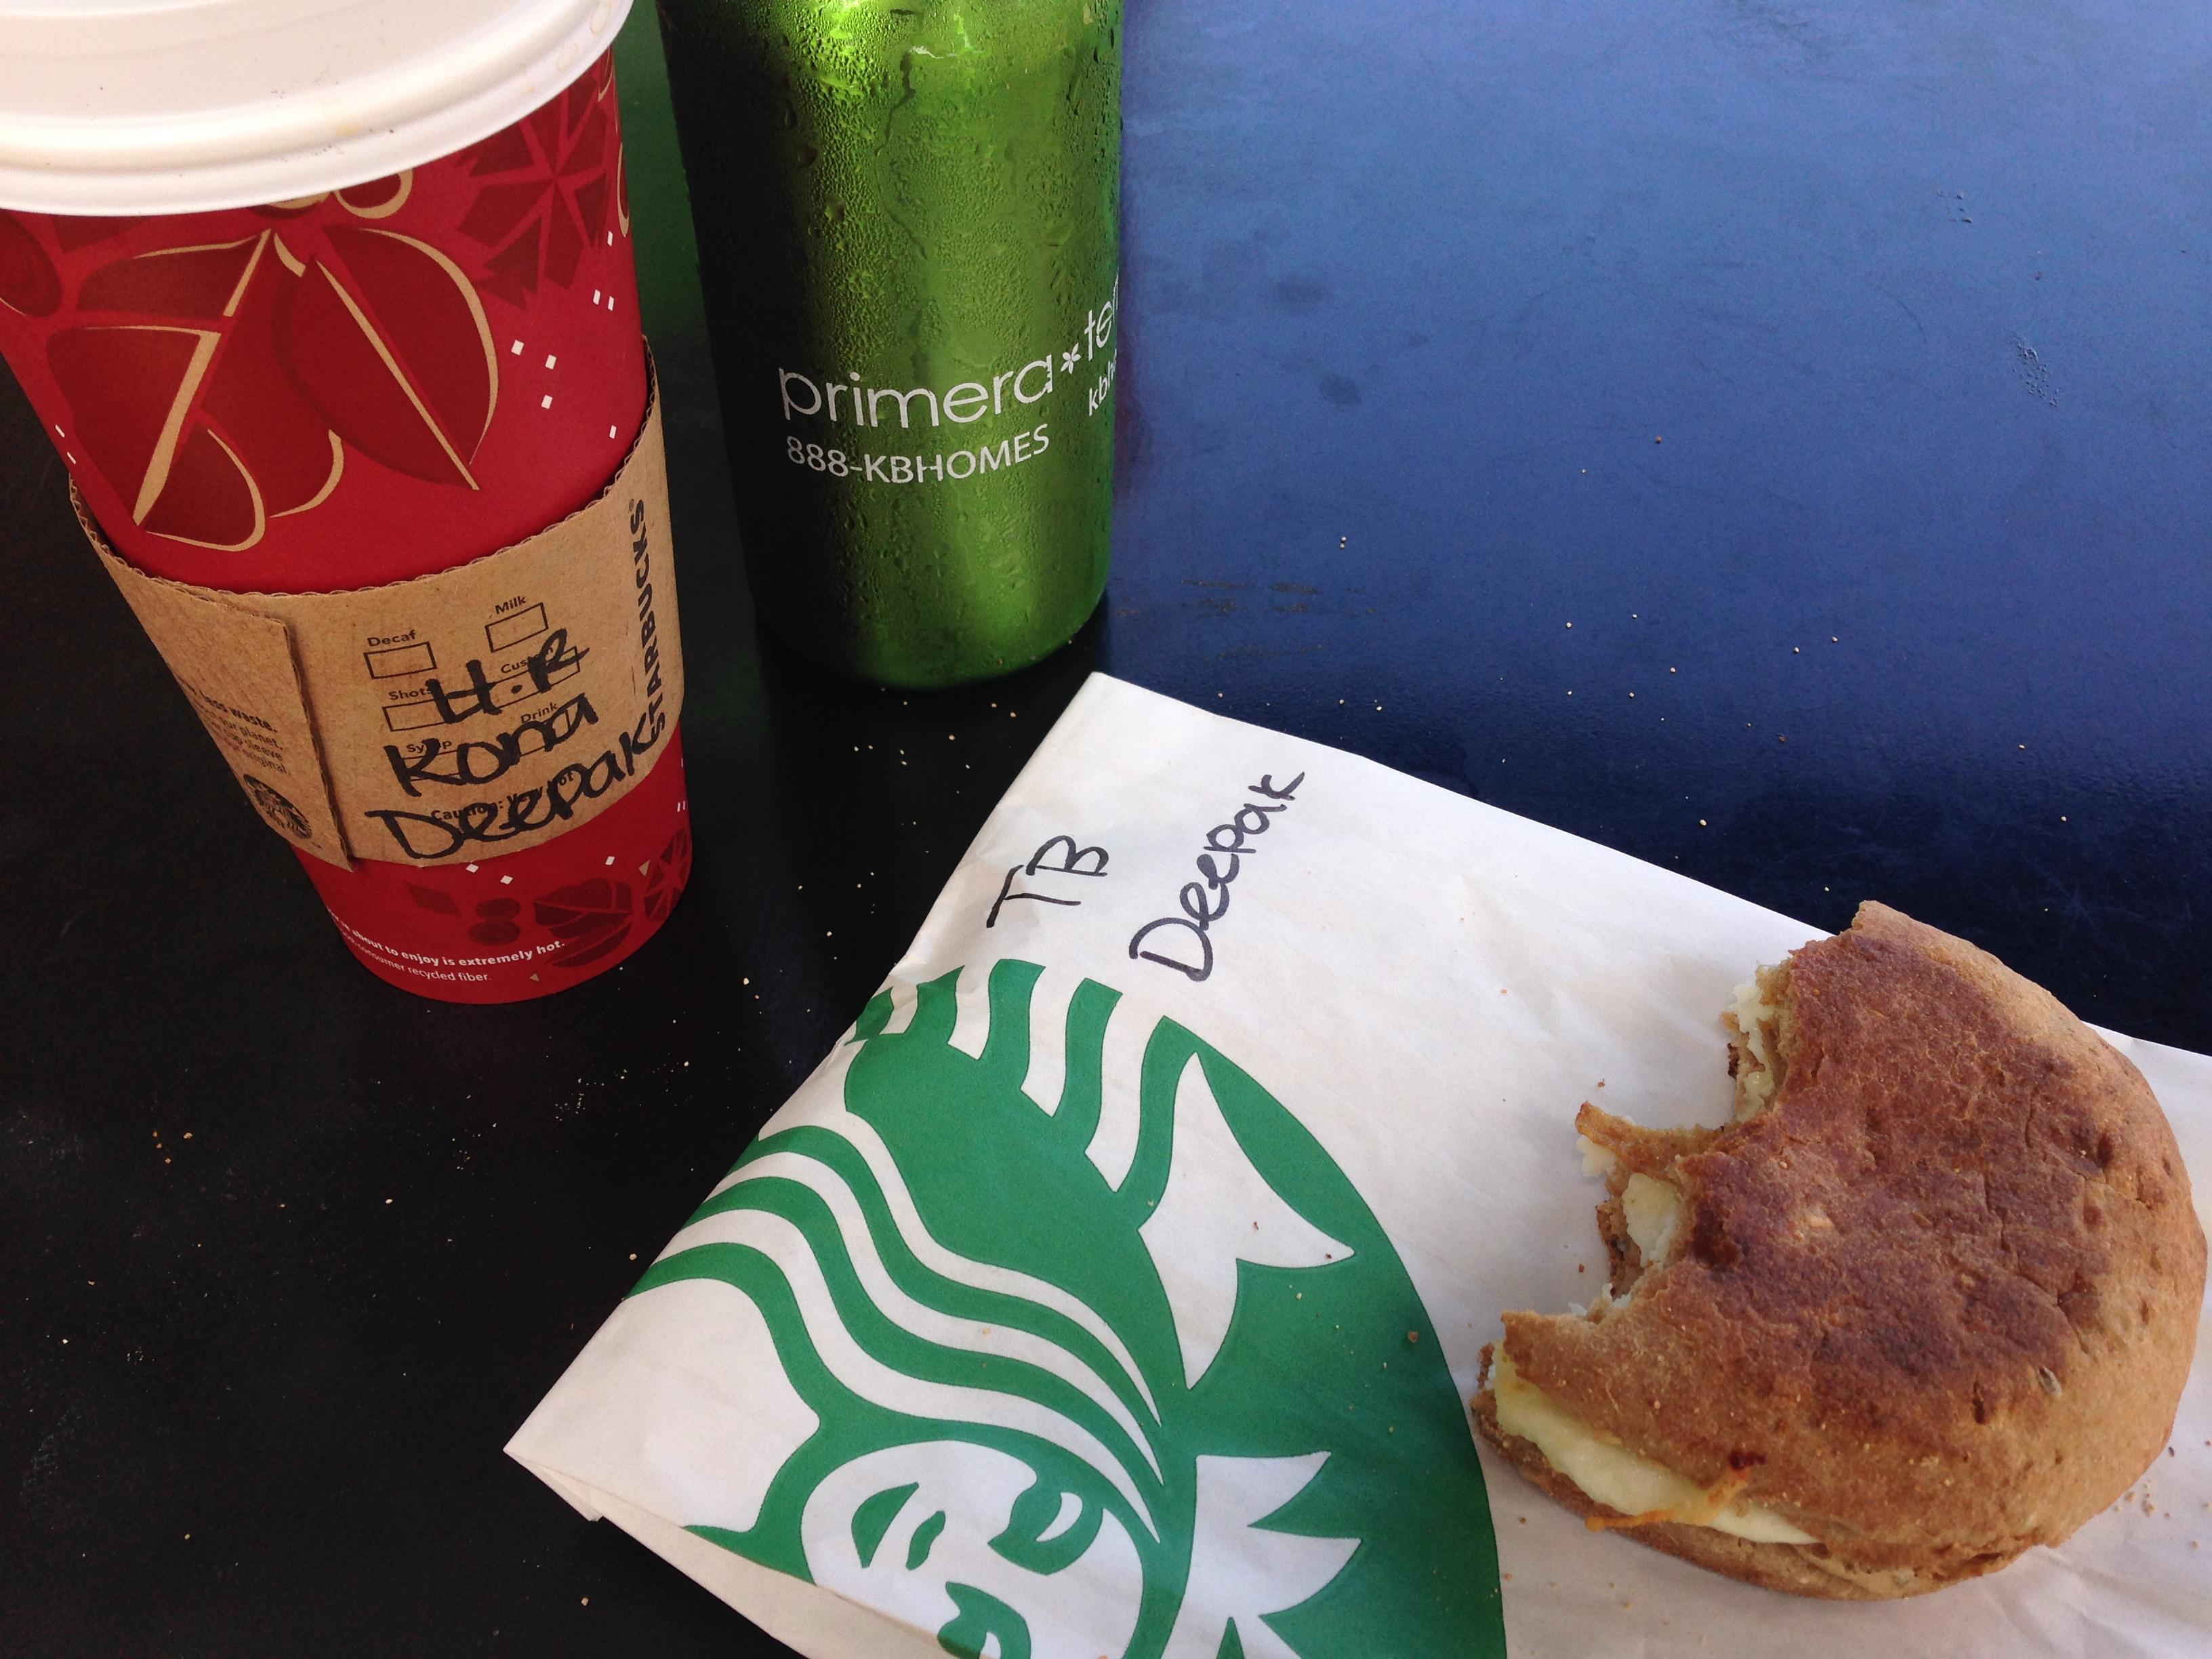 Kona Starbucks coffee -- an unadvertised island specialty!